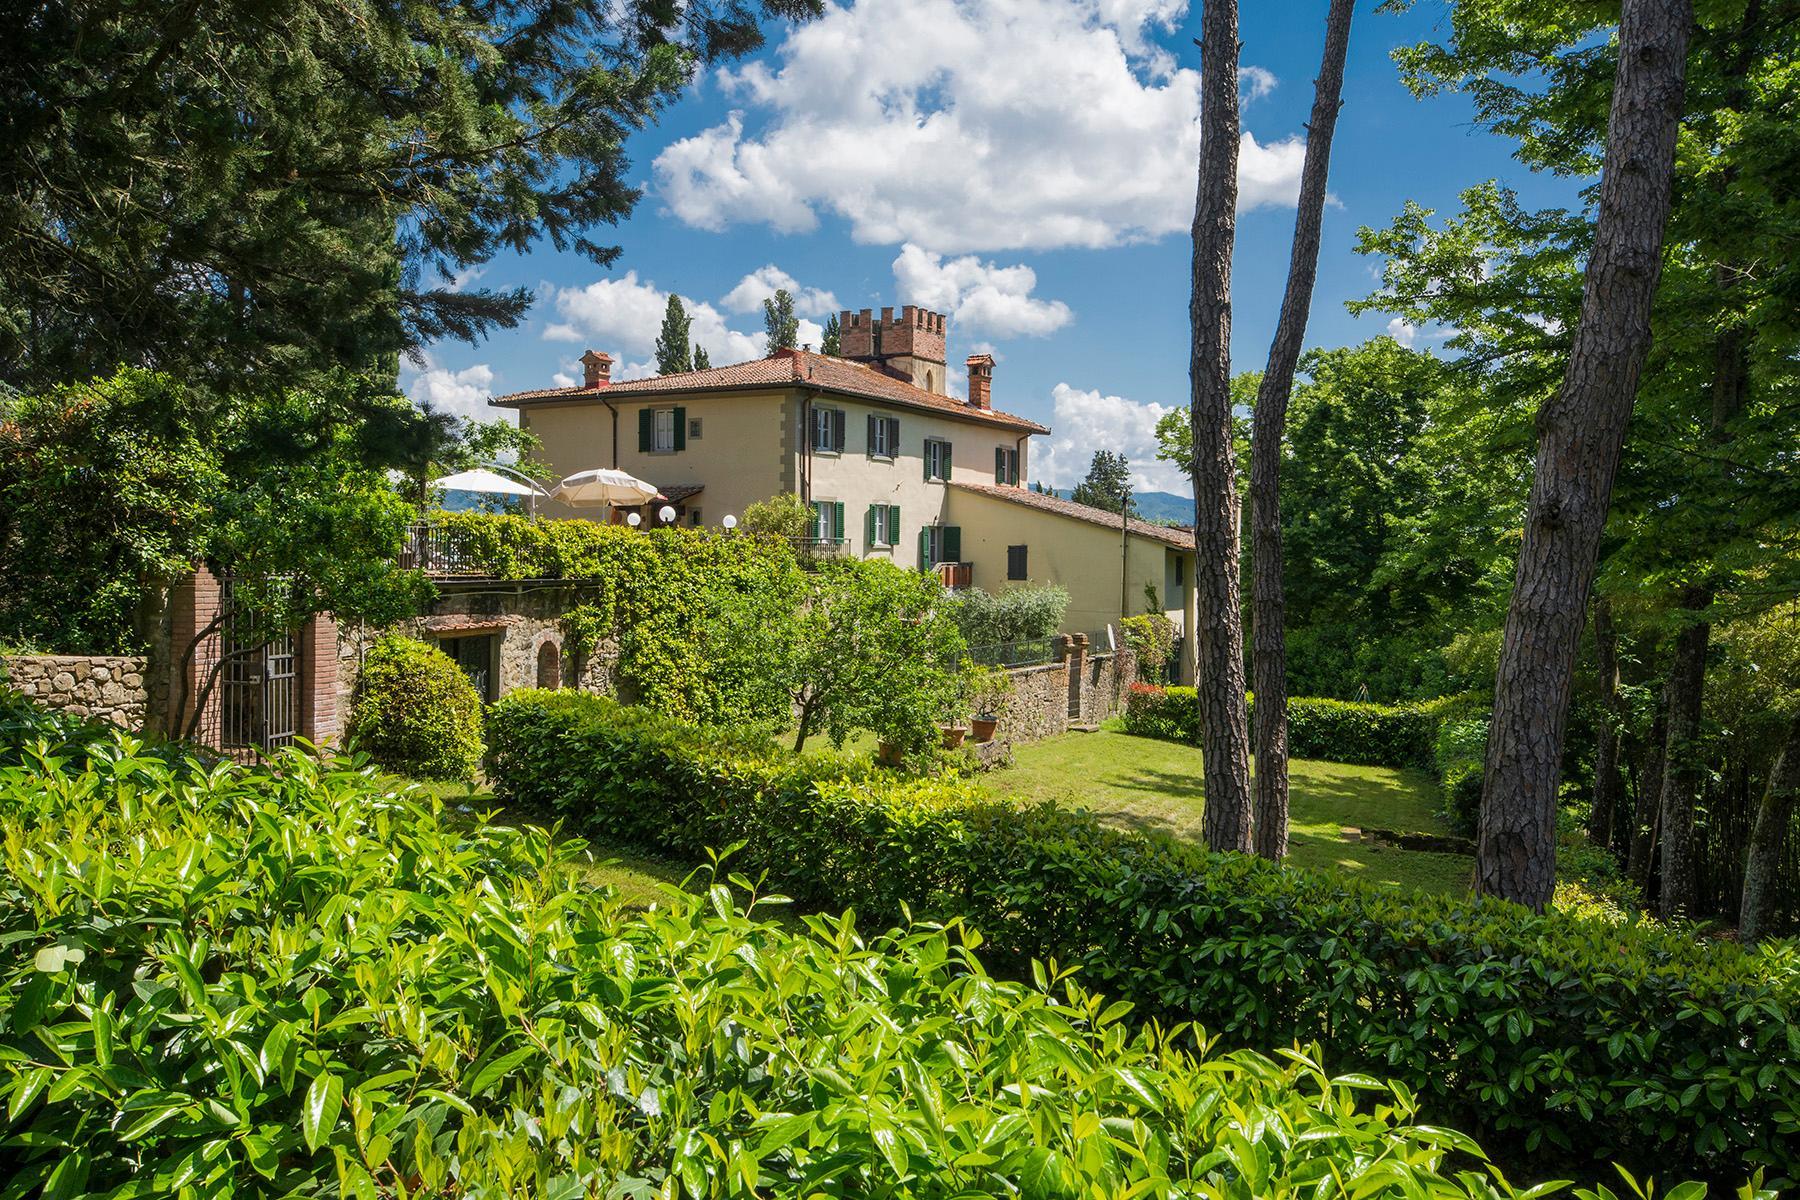 Villa charmante dans dans la Val di Sieve - 3